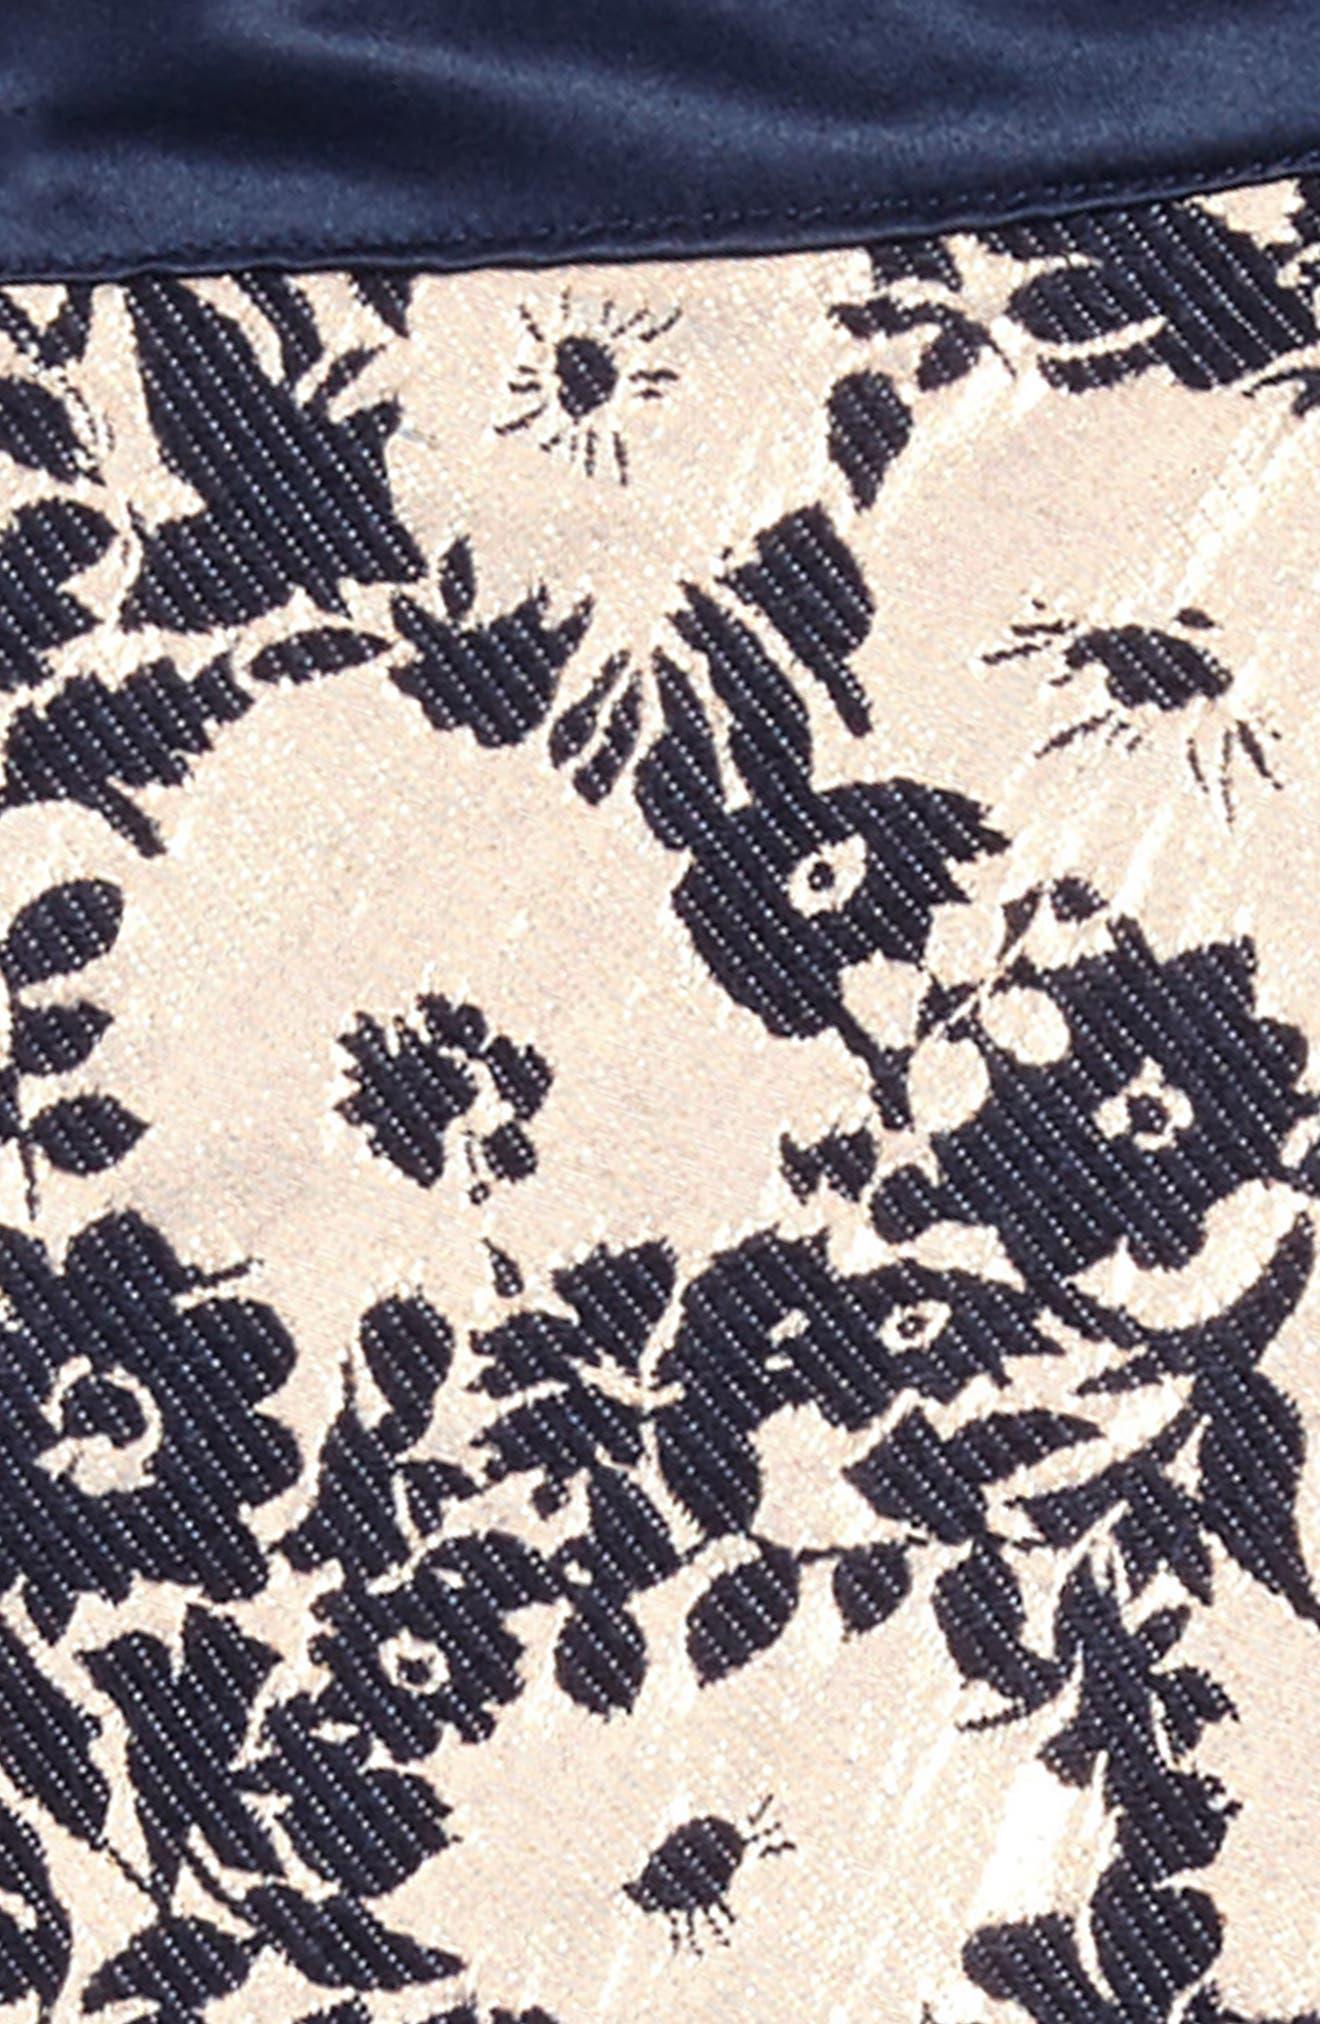 Alternate Image 3  - BLUSH by Us Angels Floral Brocade Fit & Flare Dress (Big Girls)